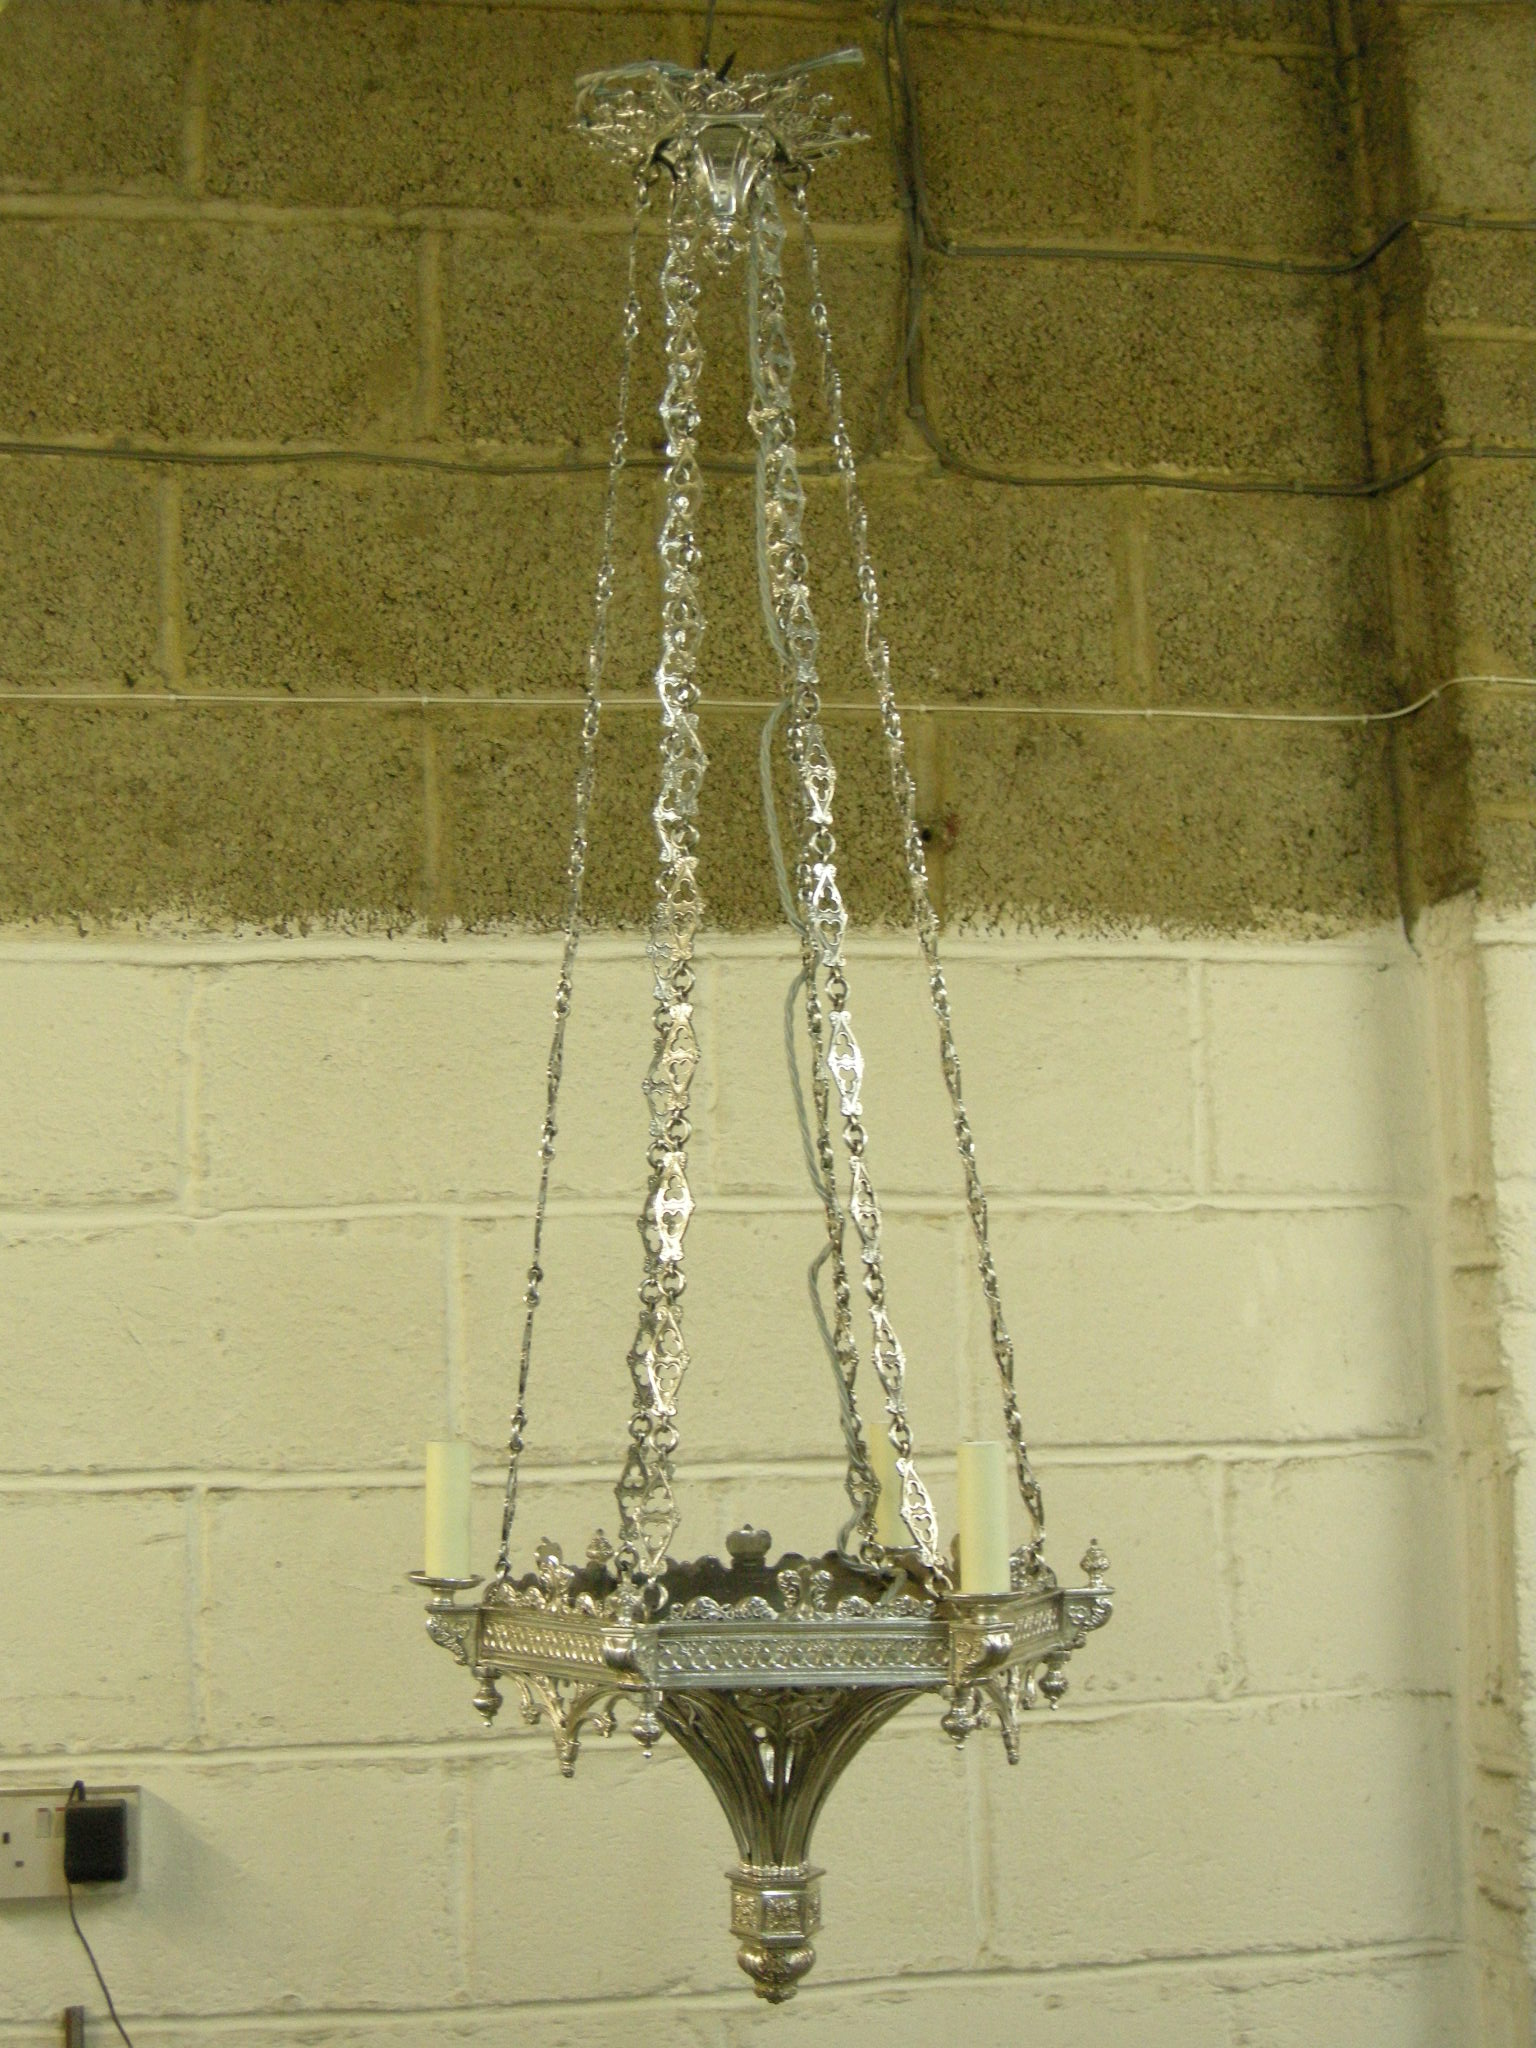 antique metals chandelier repairs restoration silver pendent chandelier before silver pendent chandelier after